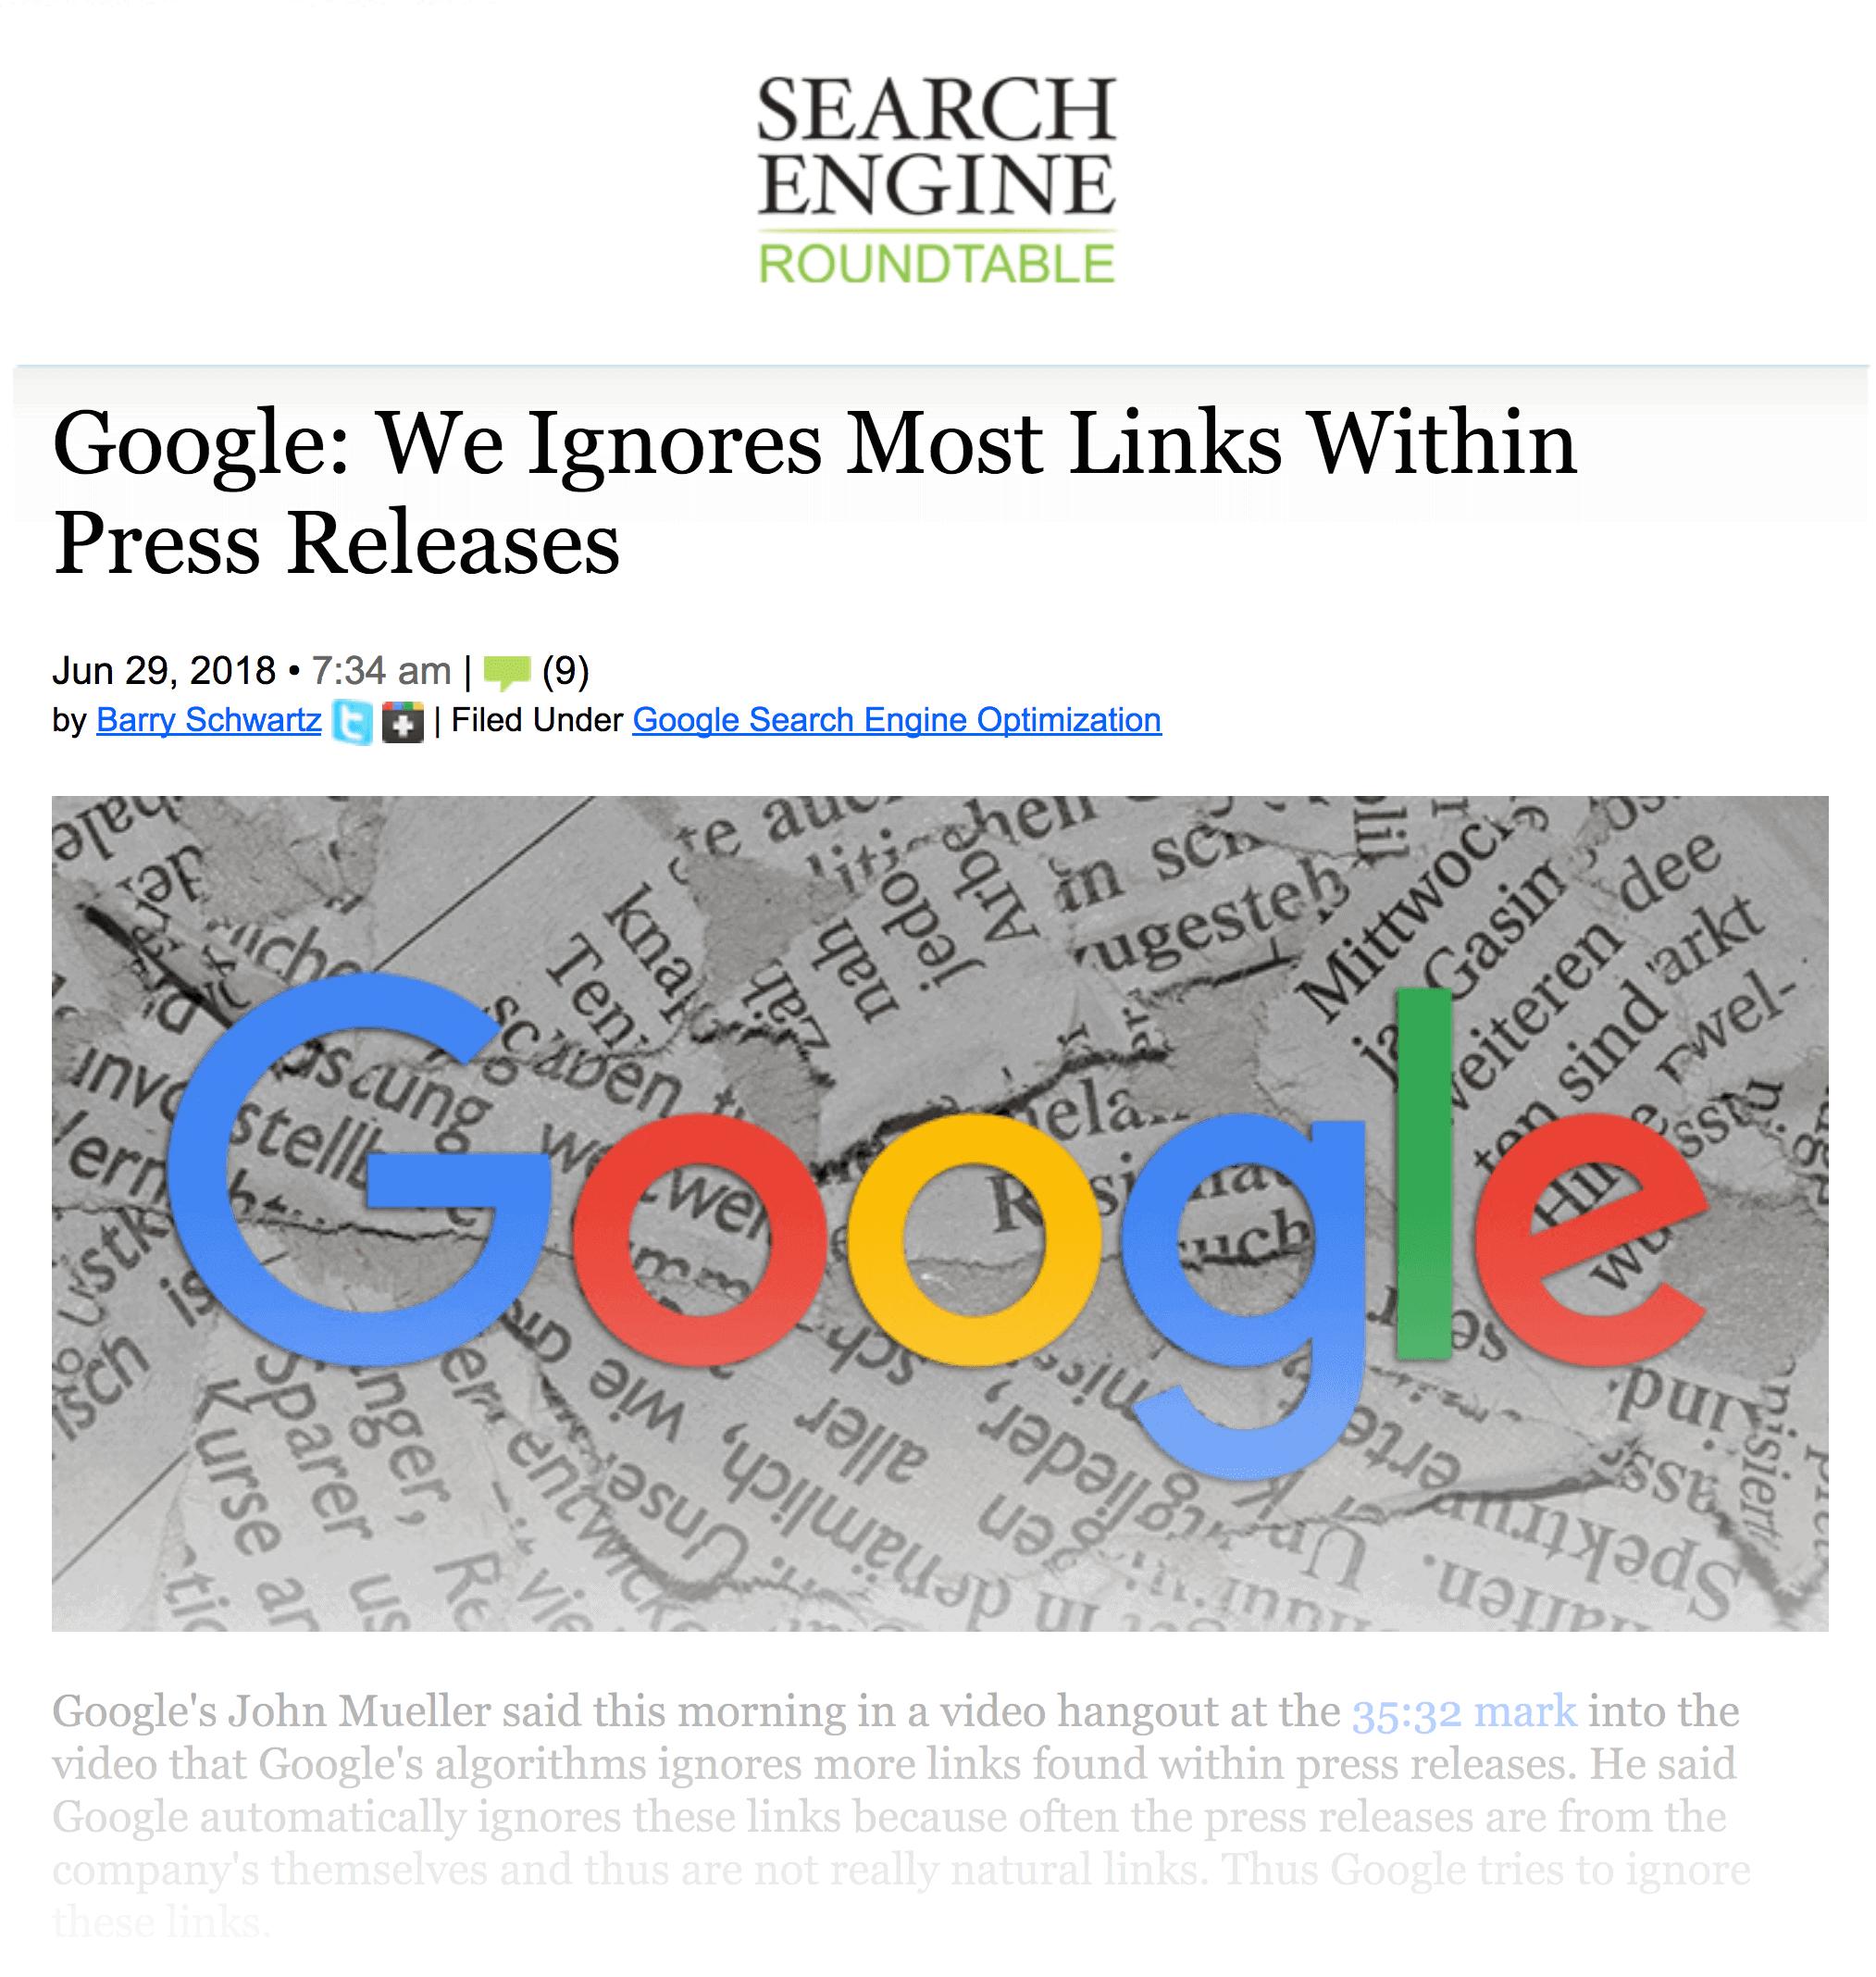 Google ignores links